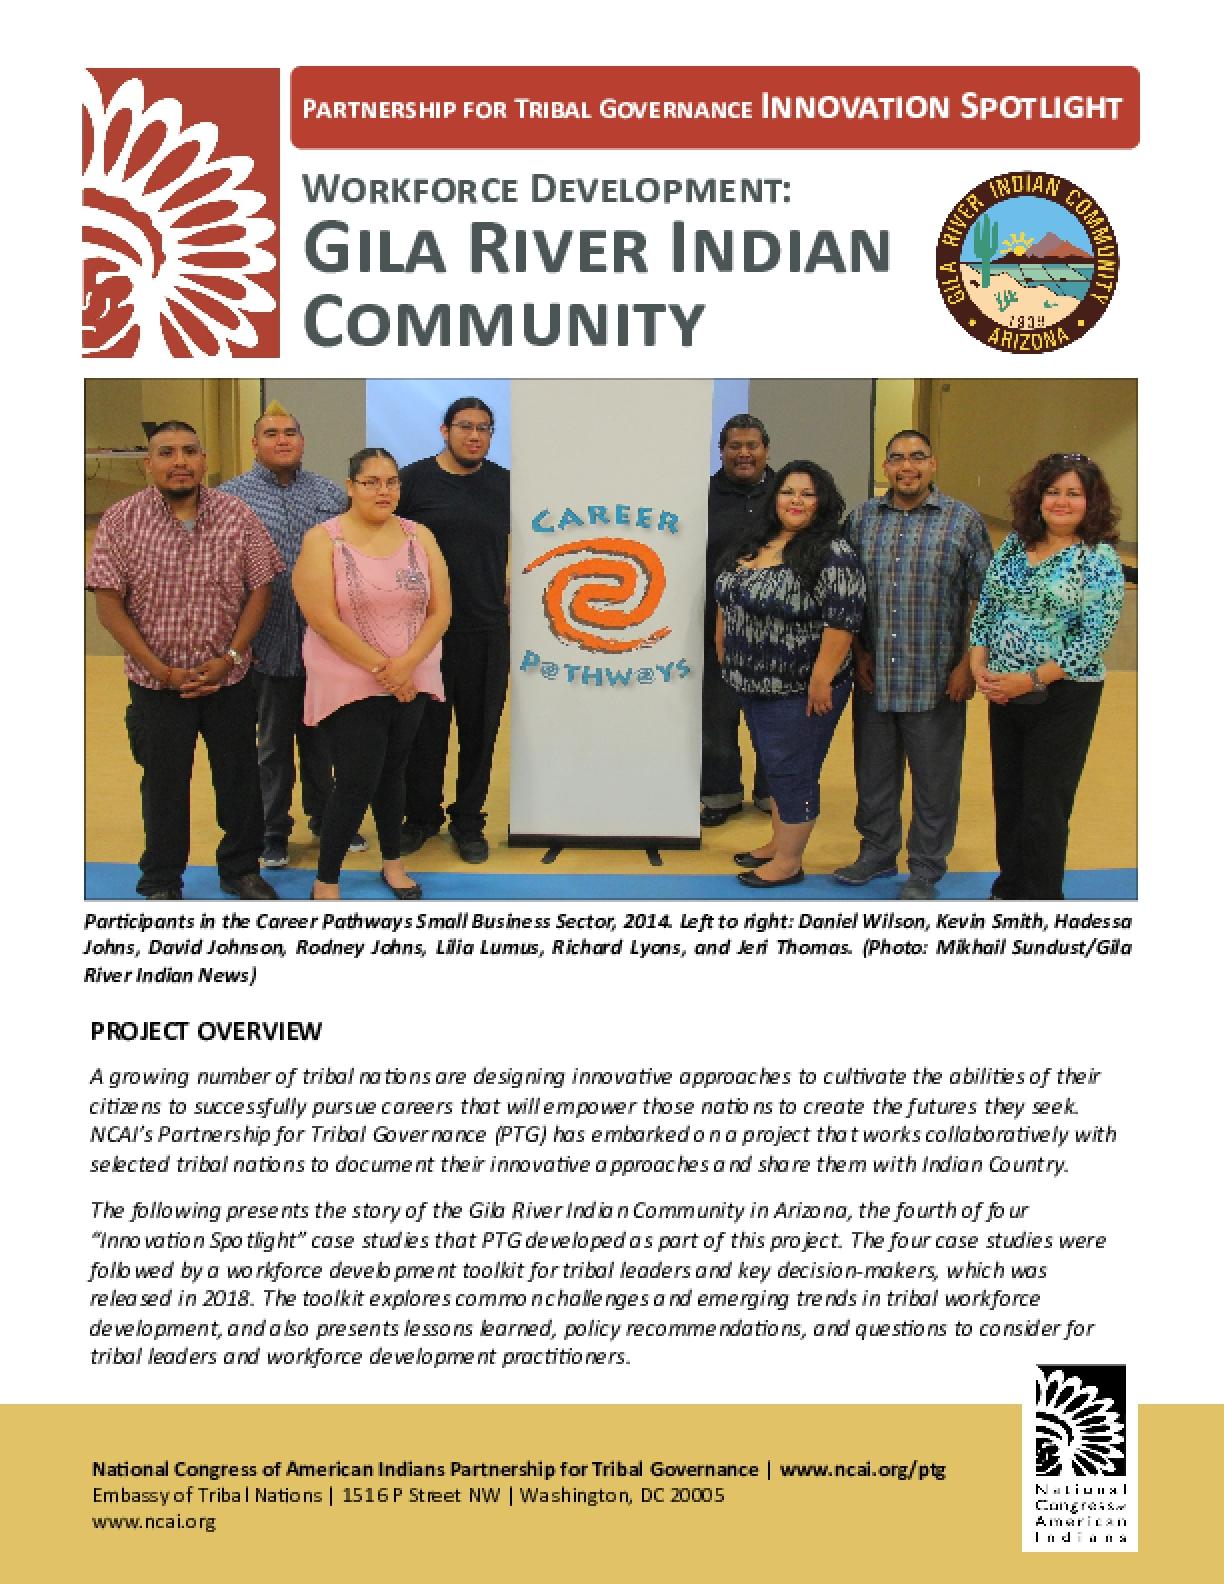 Workforce Development: Gila River Indian Community